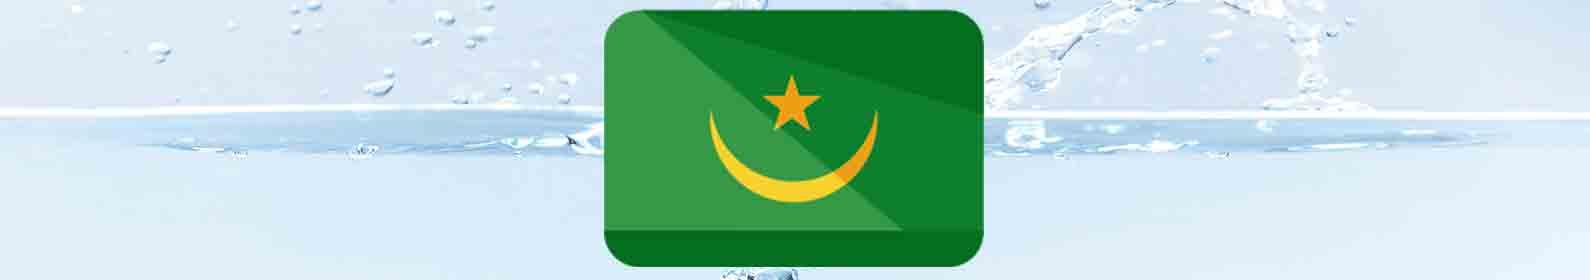 water-treatment-mauritania.jpg